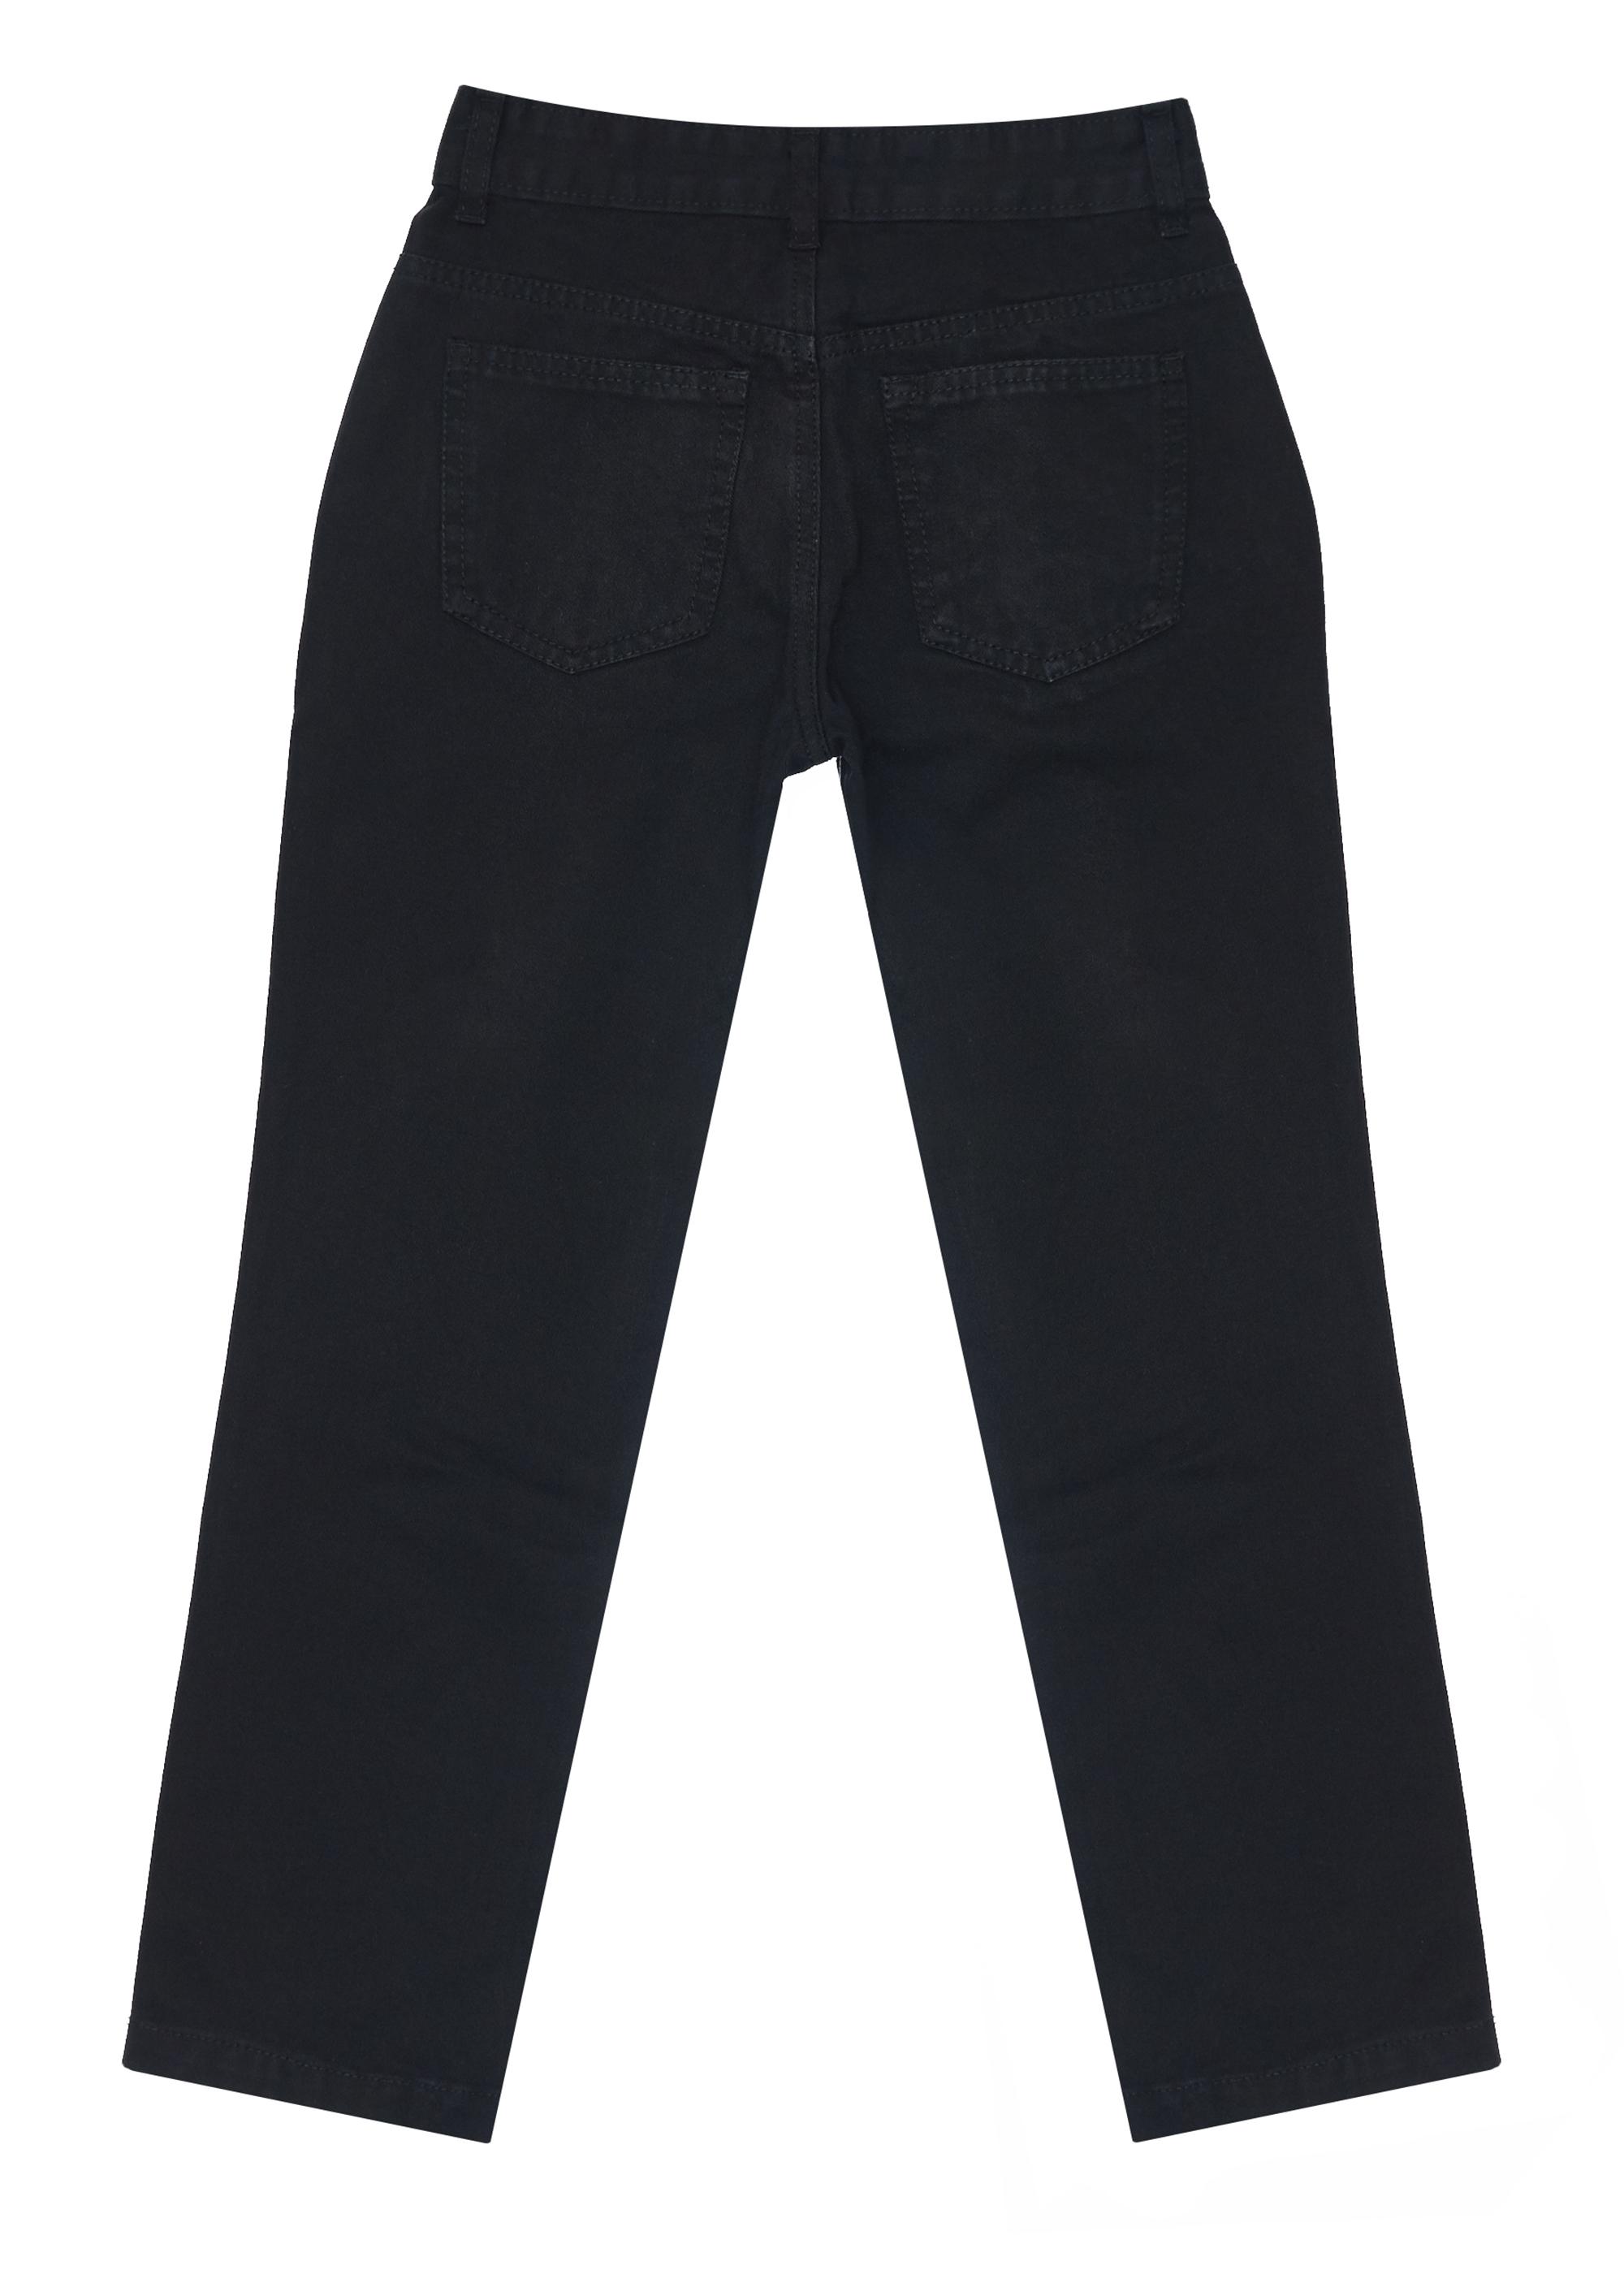 Chlapecké kalhoty West - šedá Černá, Navy, Šedá